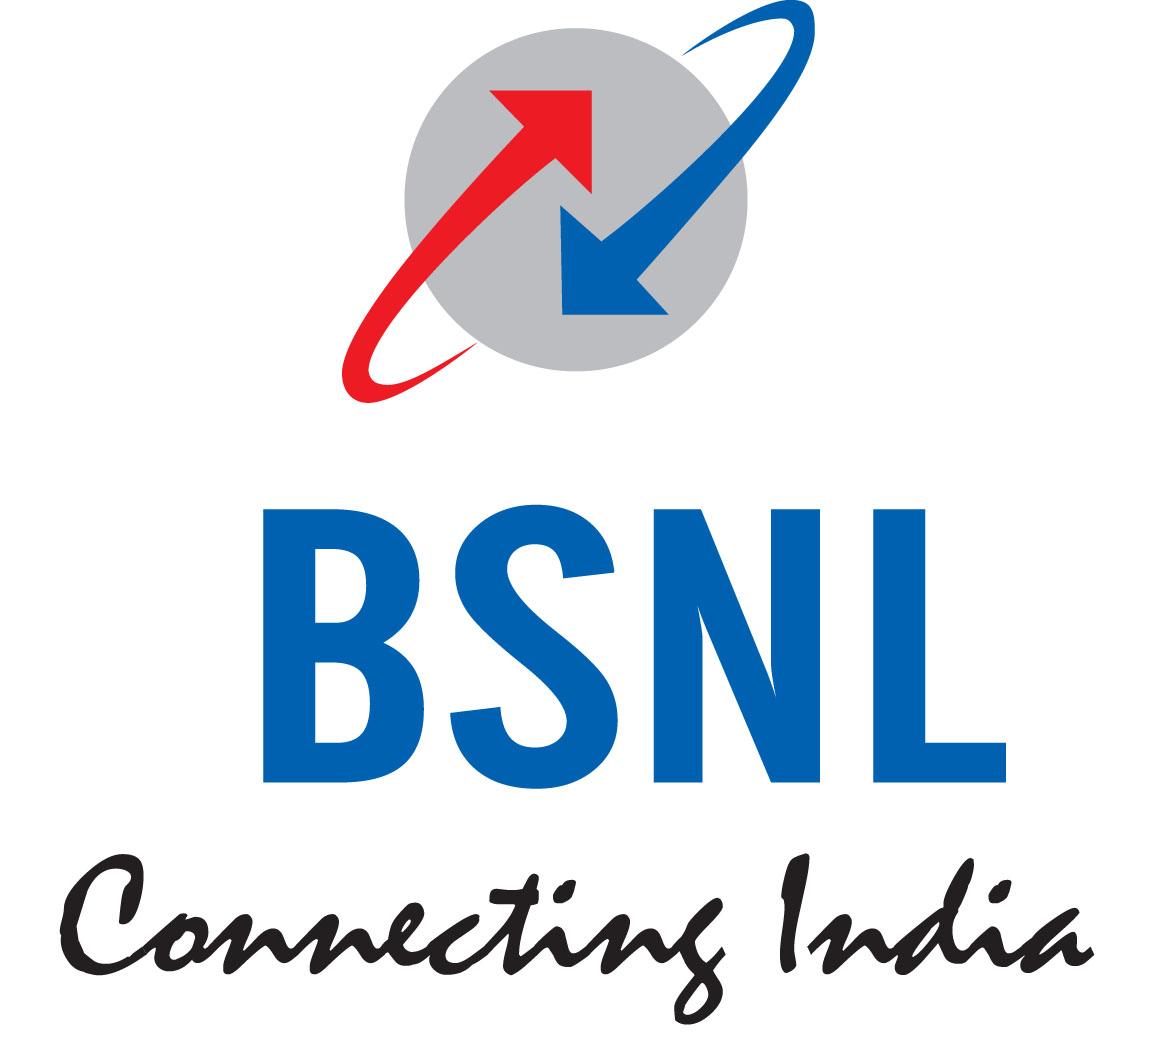 BSNL's last ditch effort to revive its landline phones has paid off